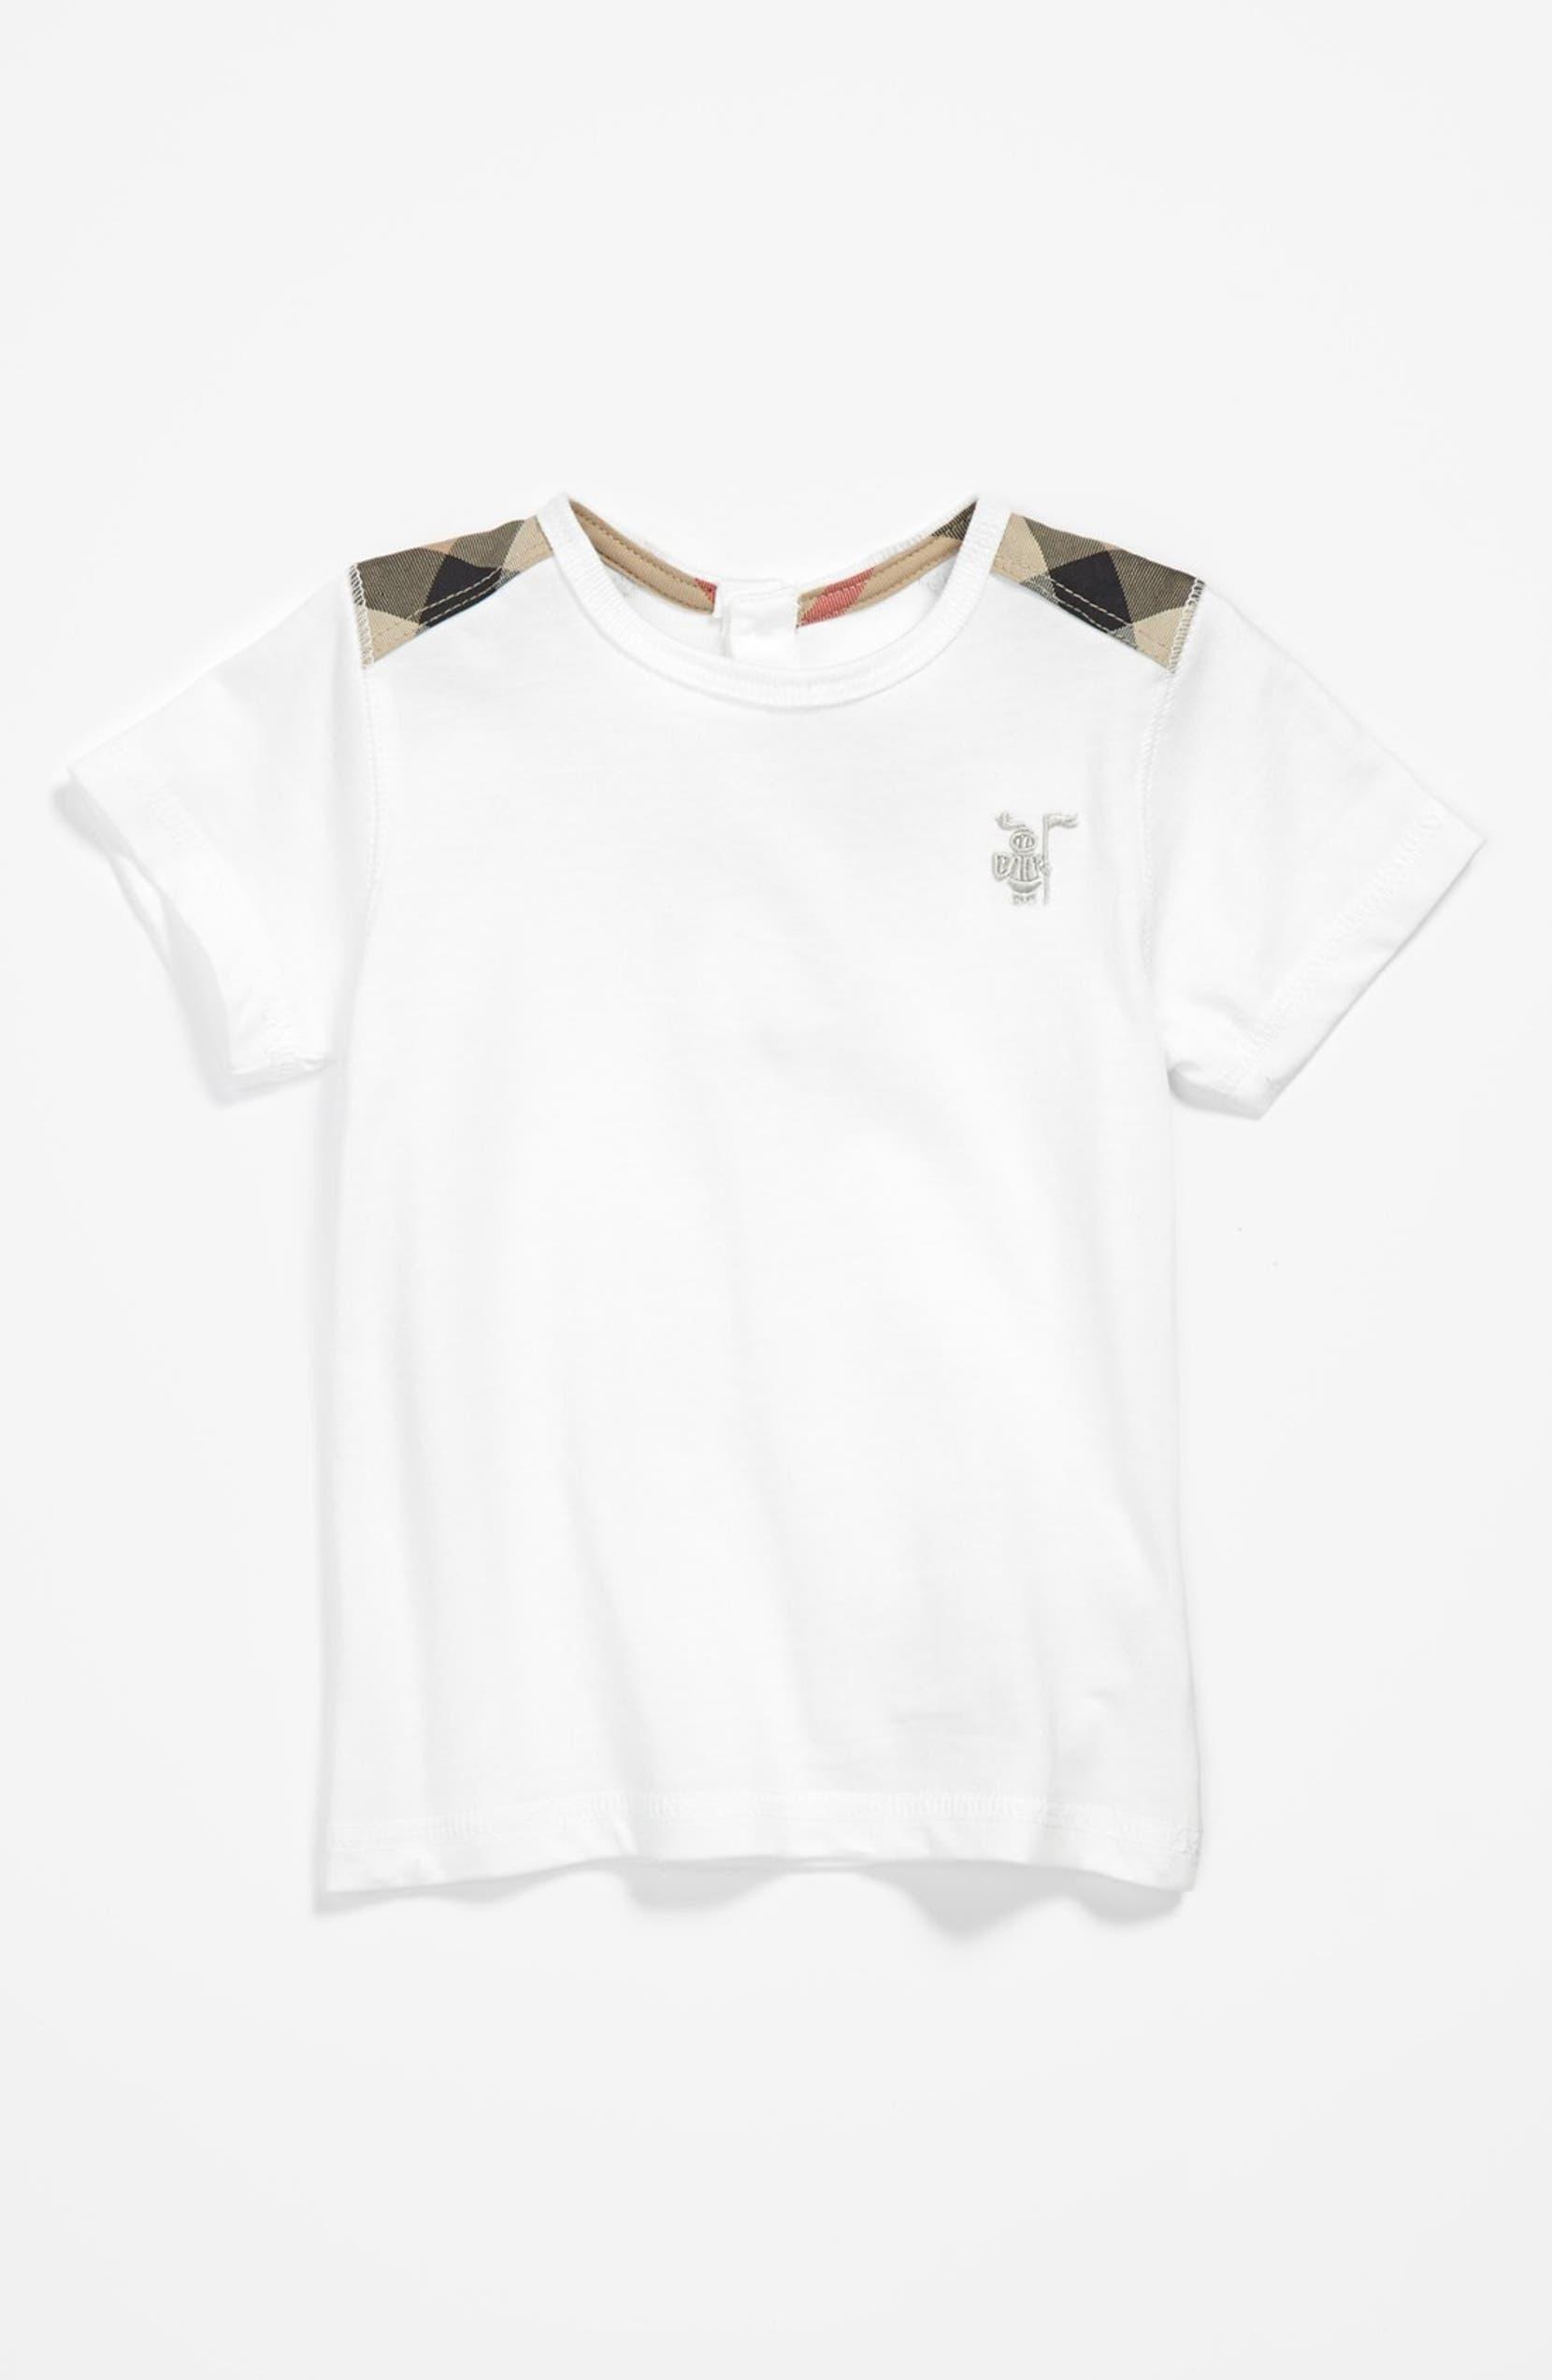 362ebecb286a Burberry  Lencel  T-Shirt (Toddler Boys)   Nordstrom